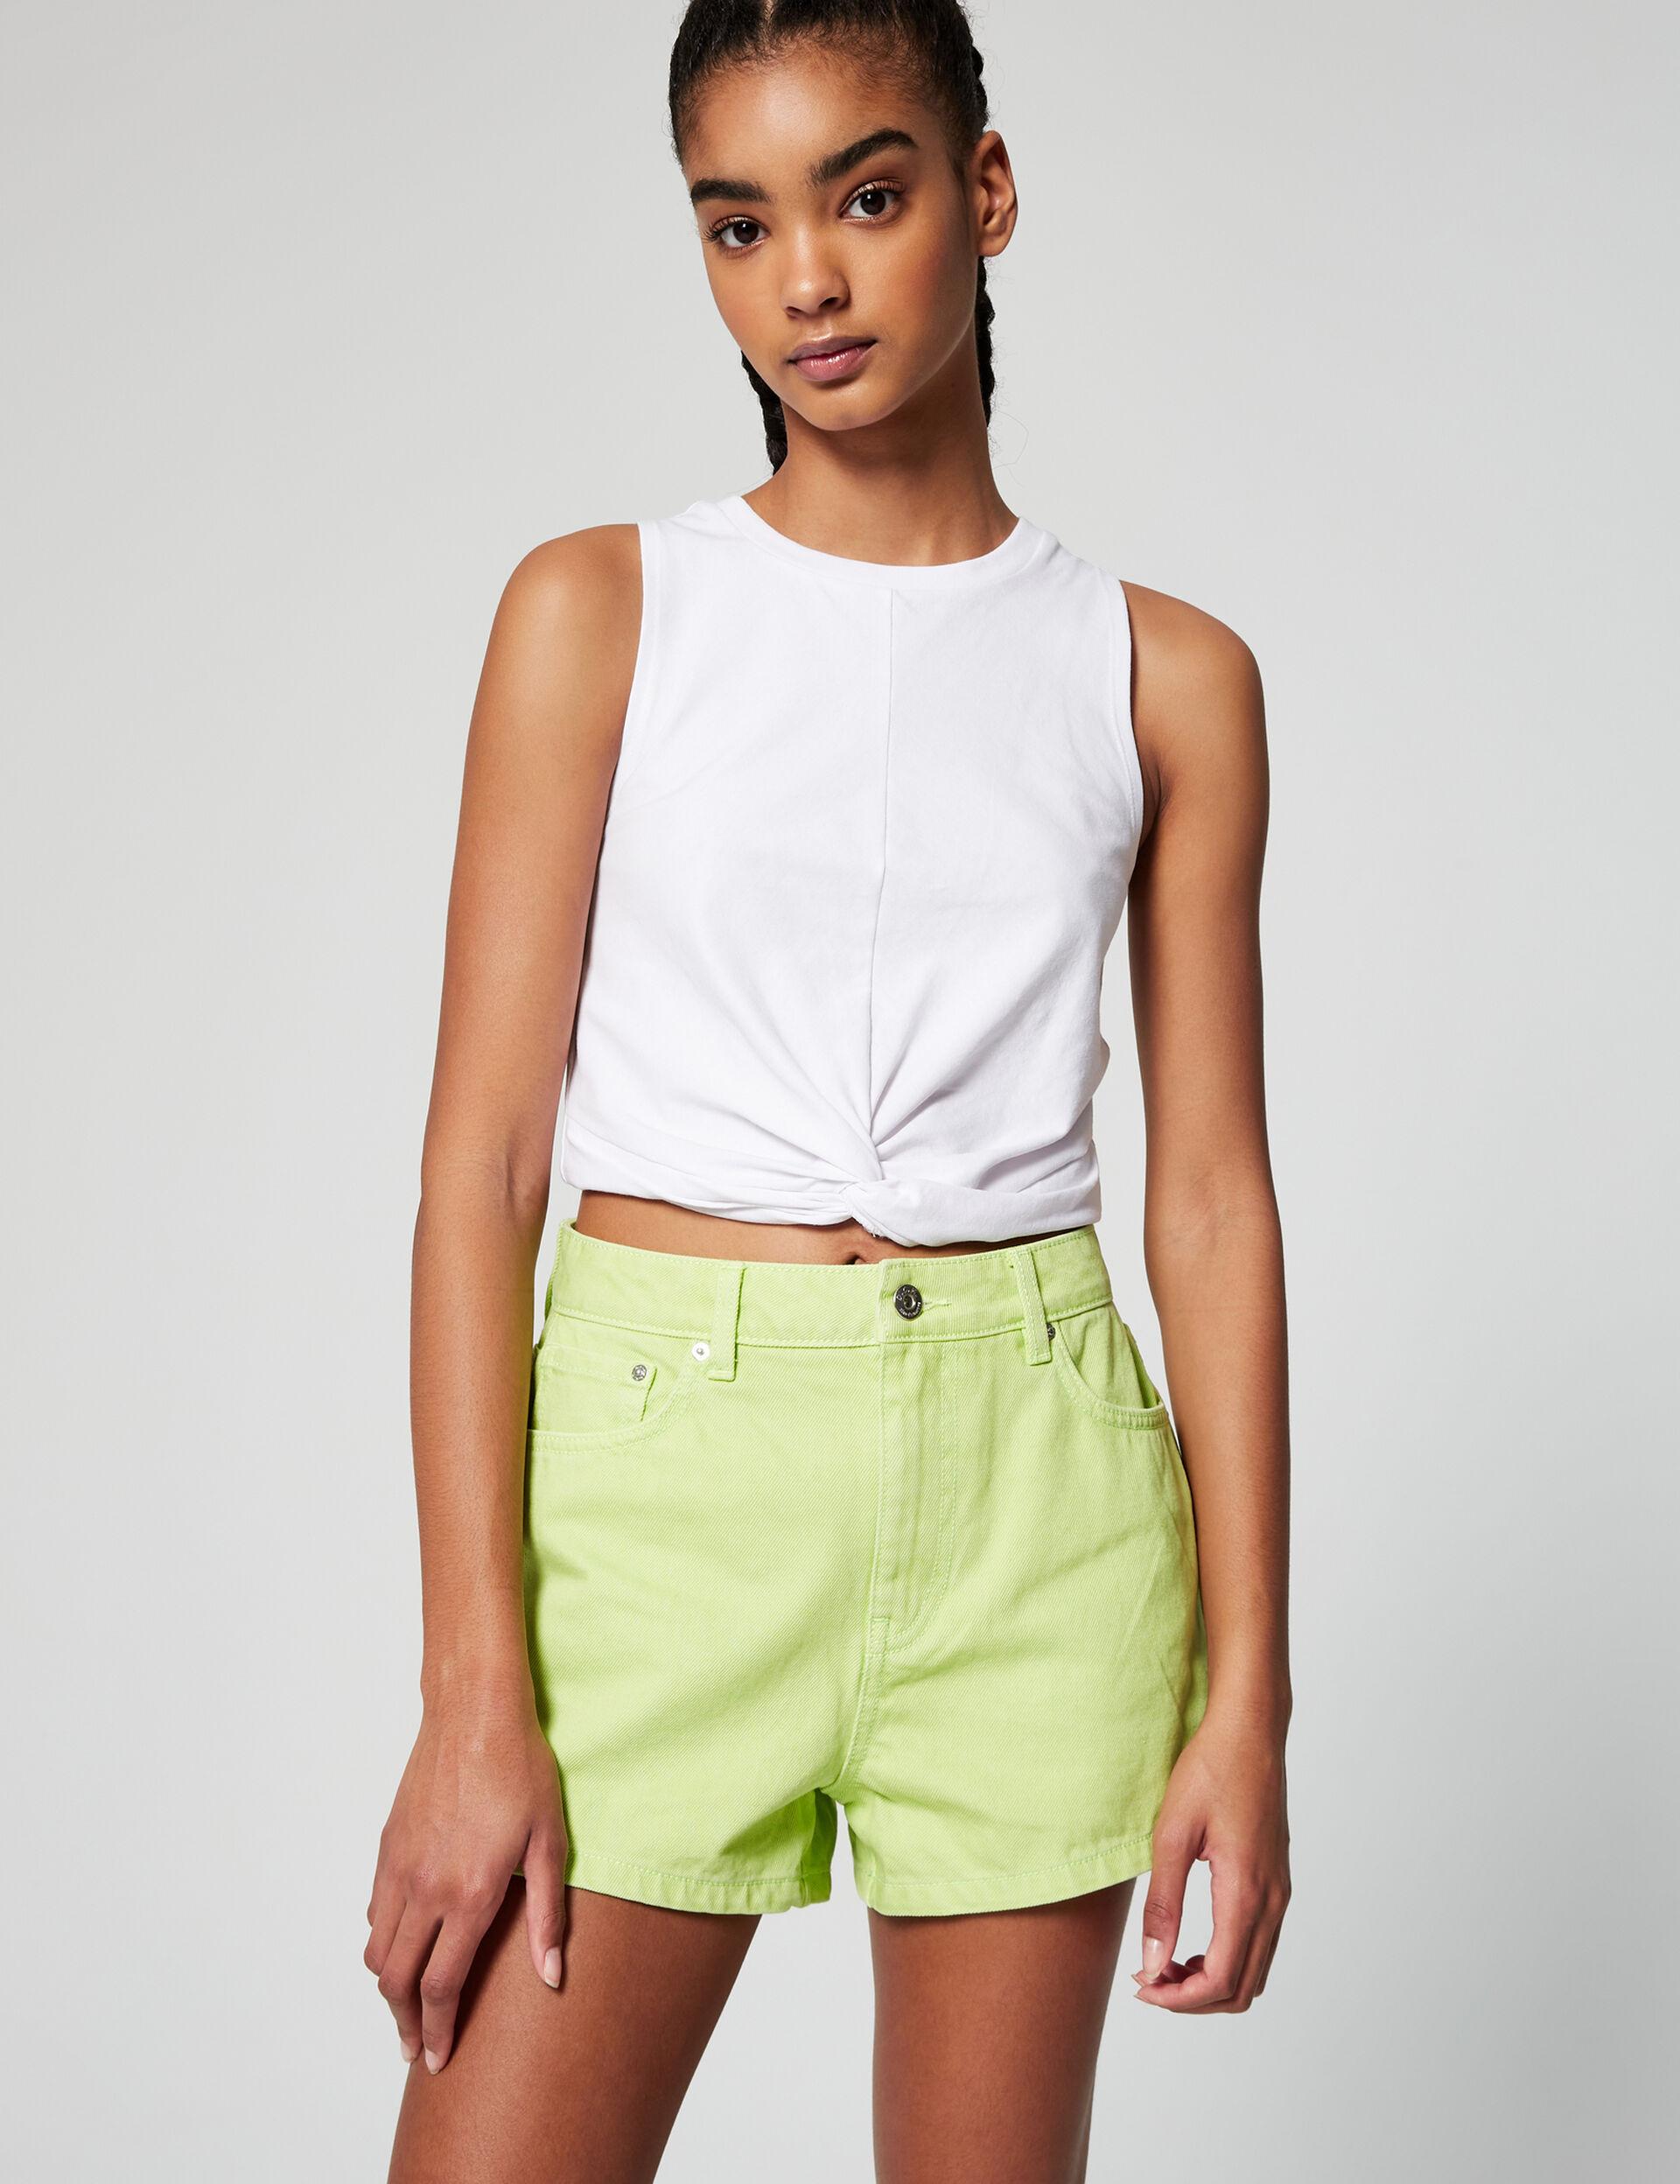 High-waisted mom shorts